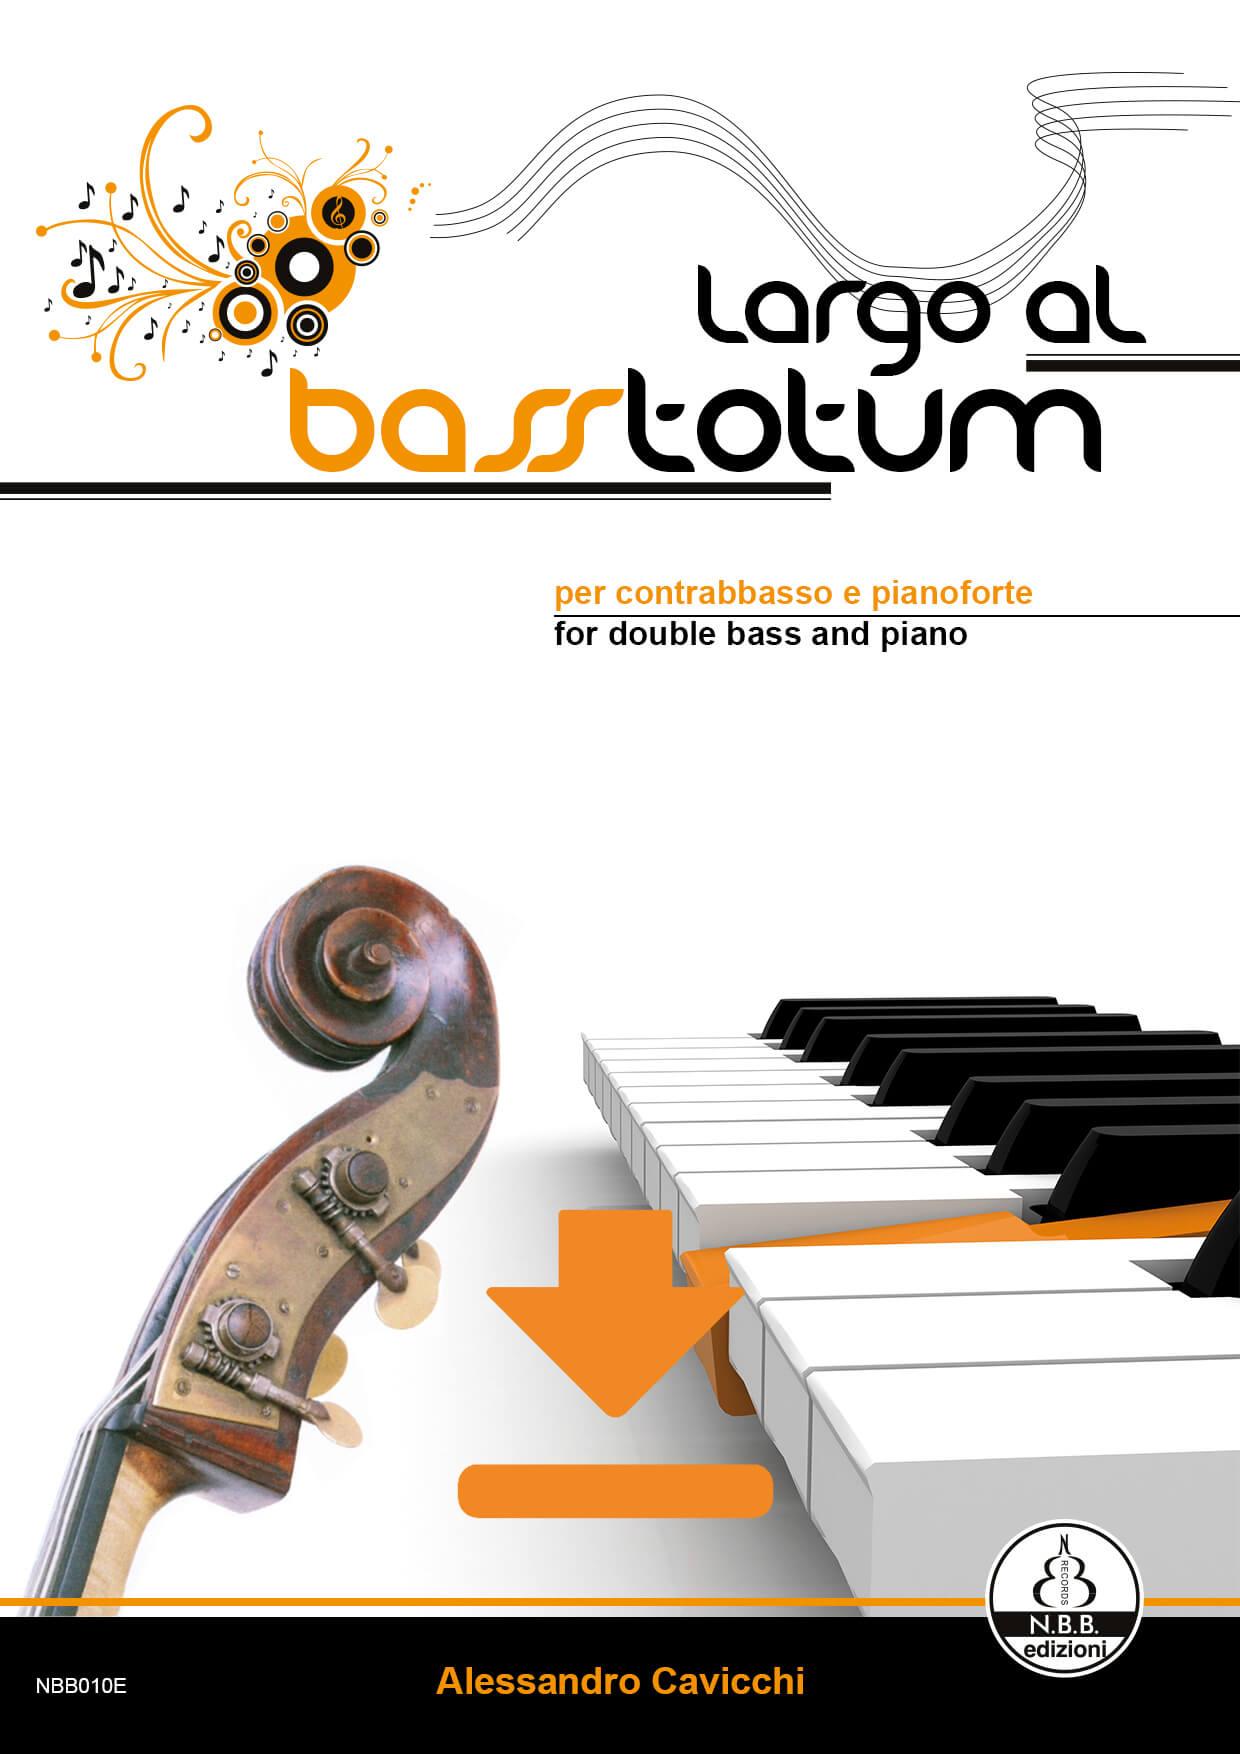 nbbrecords-basstotum-pdf-front